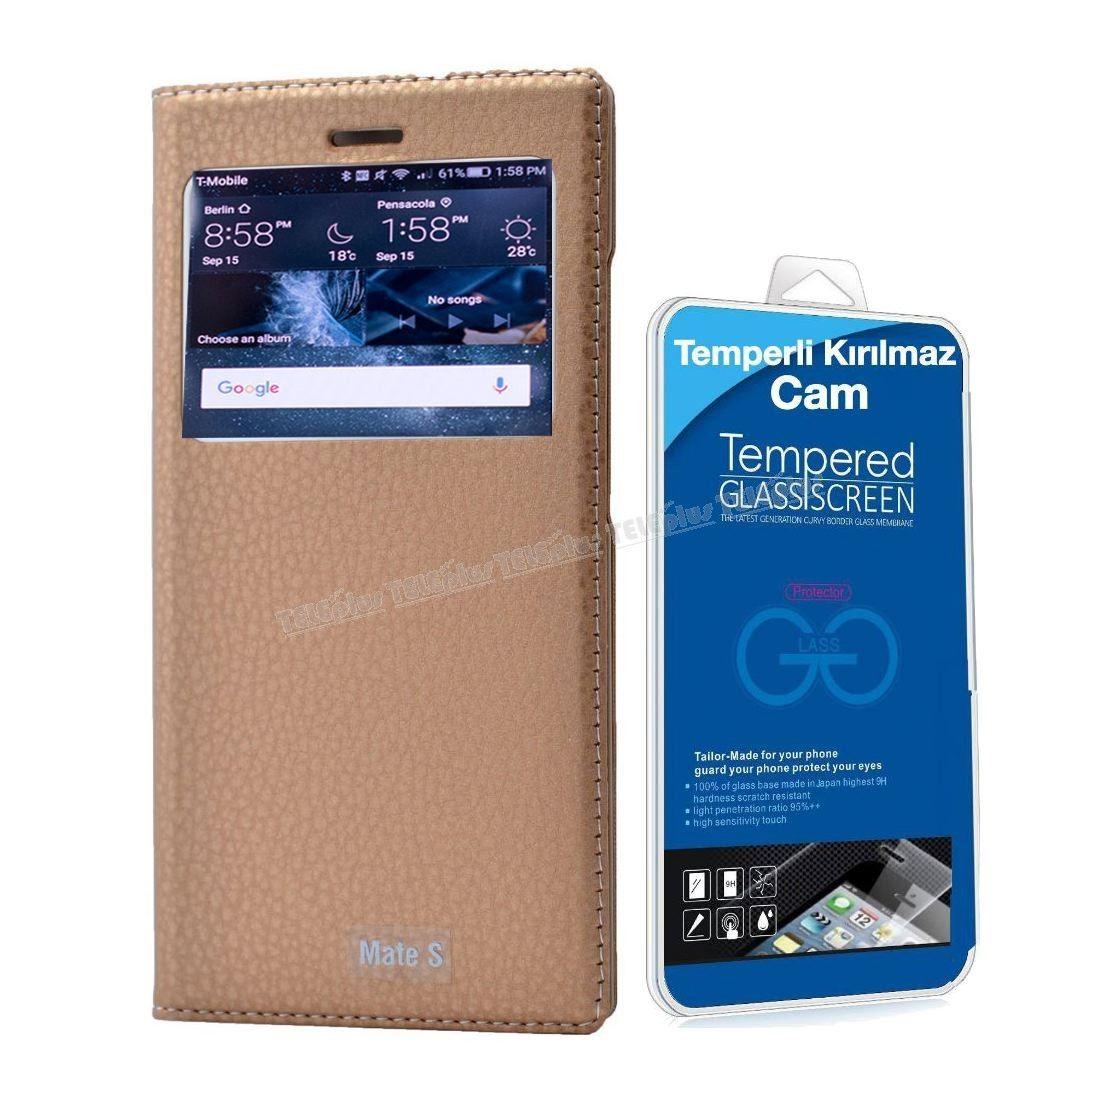 Huawei Mate S Lux Pencereli Kılıf Sarı + Temperli Kırılmaz Cam -  - Price : TL29.90. Buy now at http://www.teleplus.com.tr/index.php/huawei-mate-s-lux-pencereli-kilif-sari-temperli-kirilmaz-cam.html